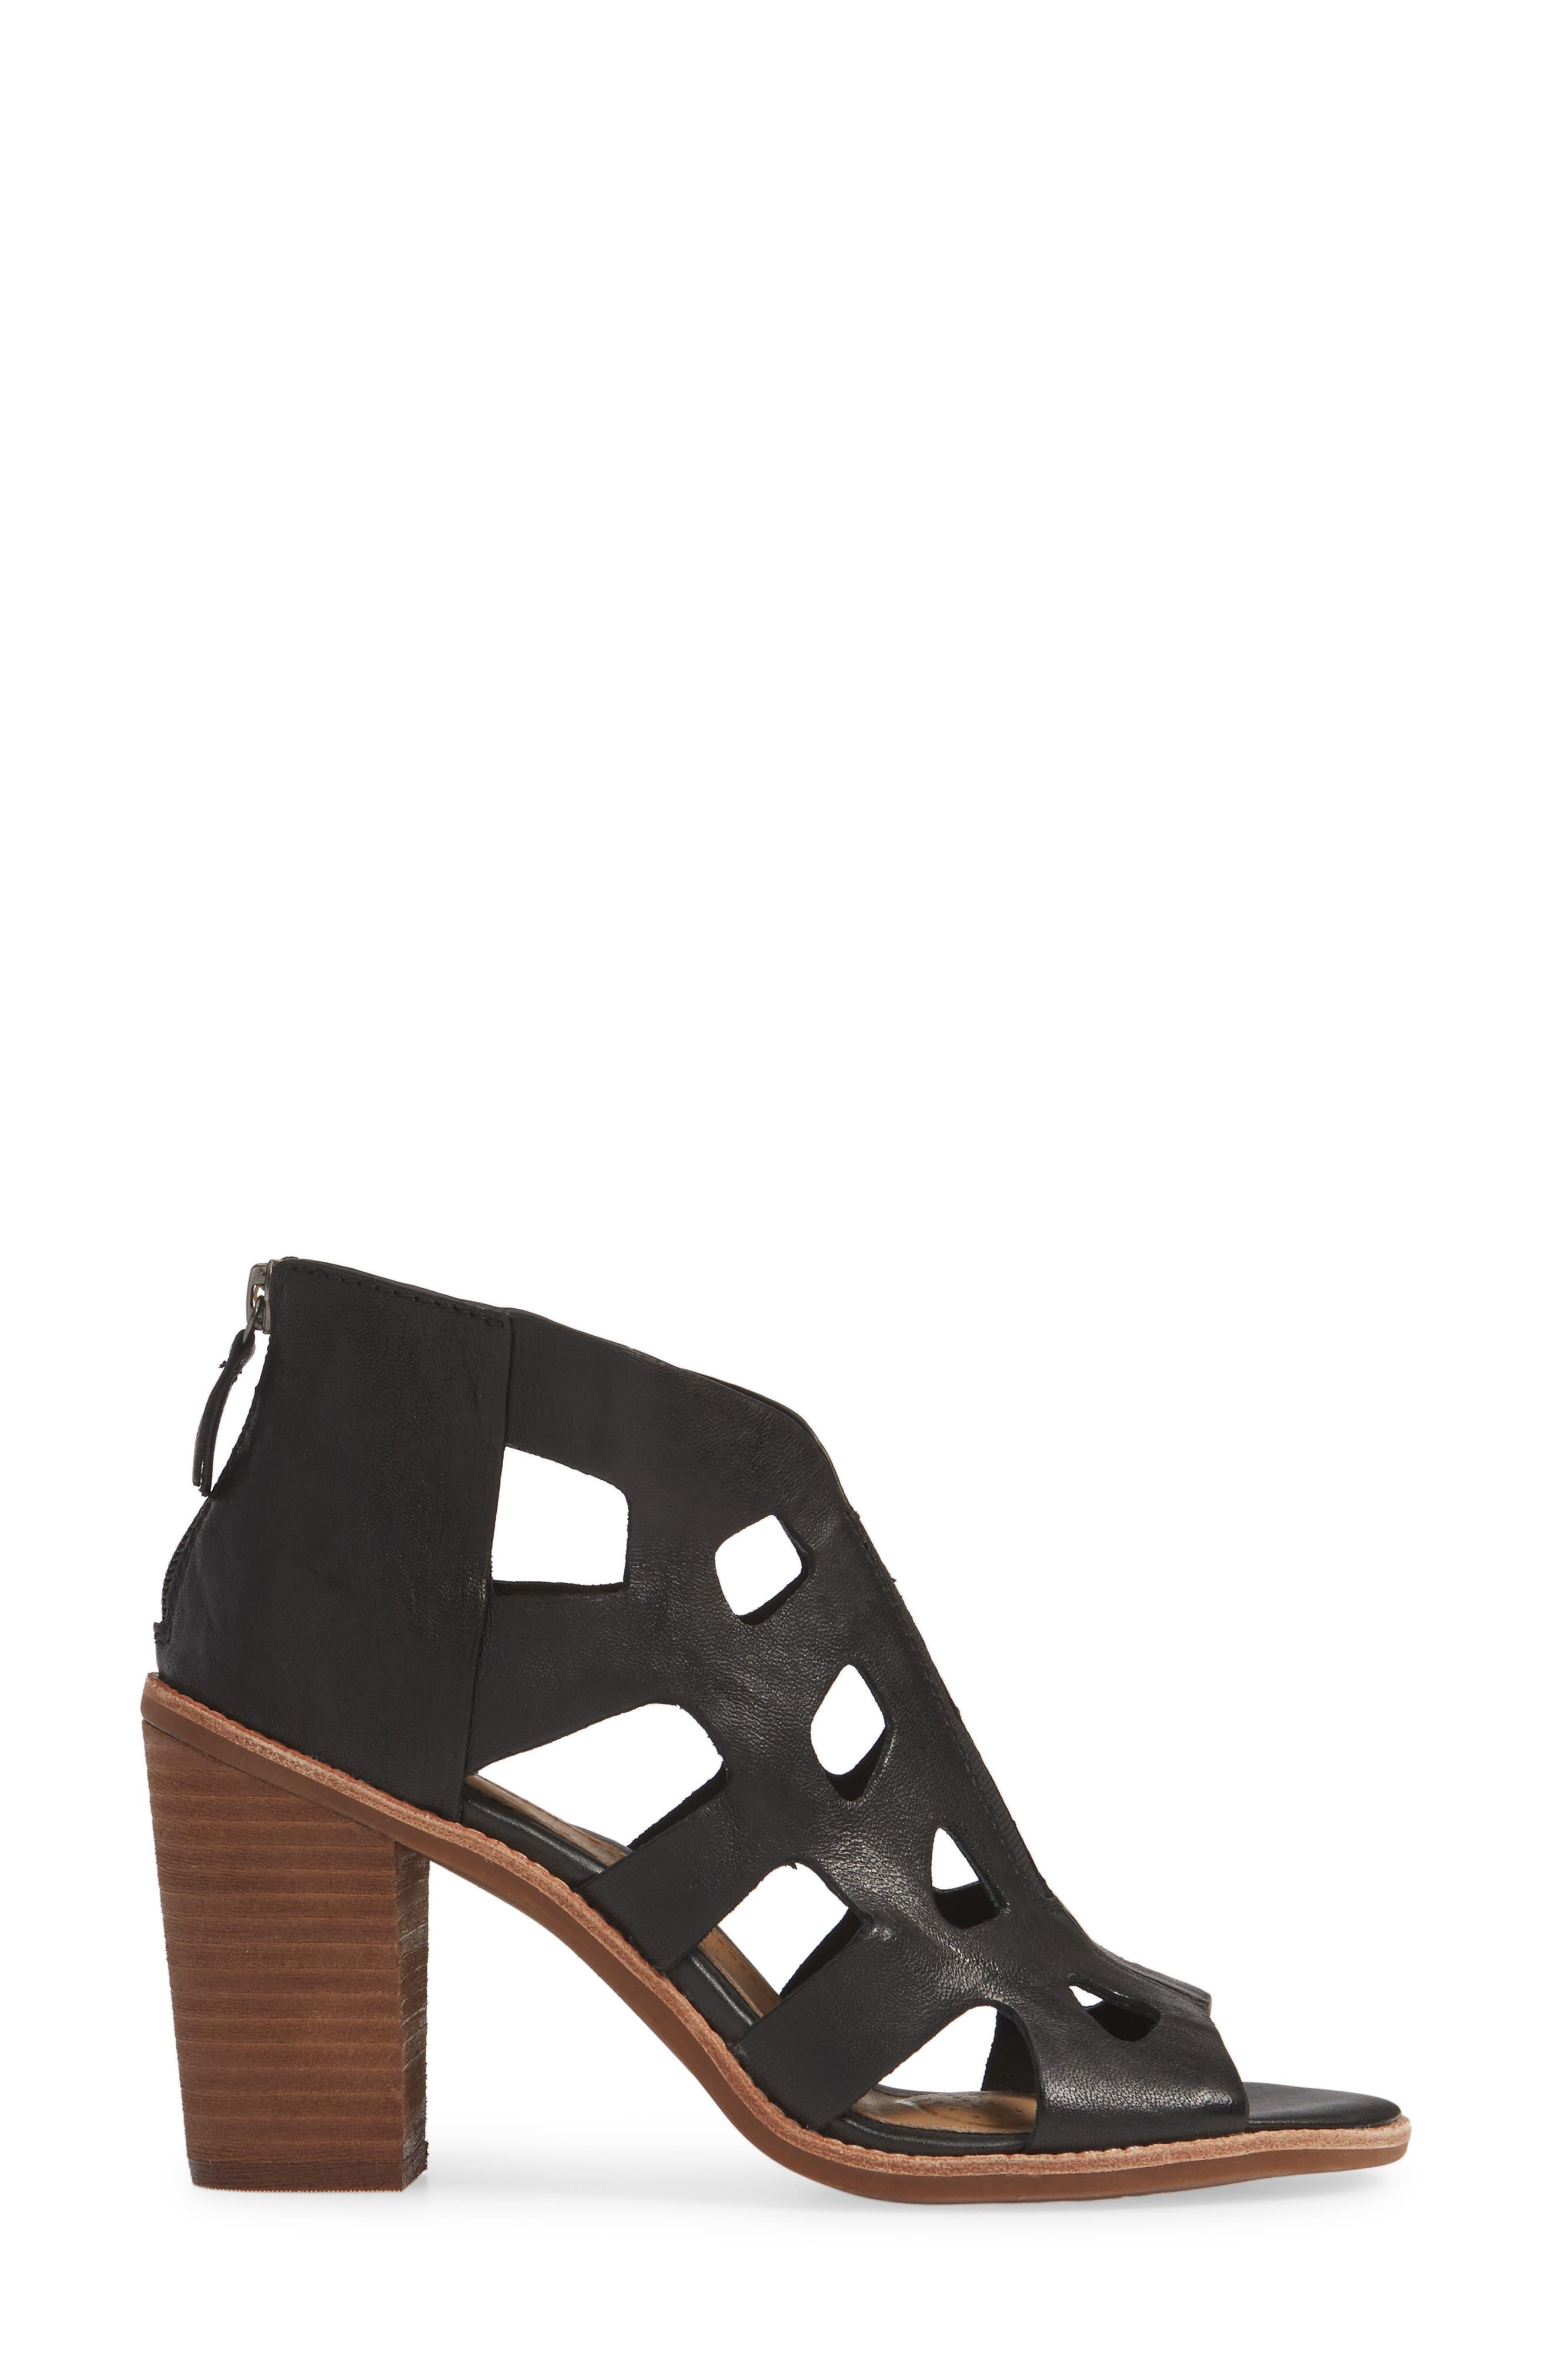 Pazia Block Heel Sandal,                             Alternate thumbnail 3, color,                             BLACK LEATHER